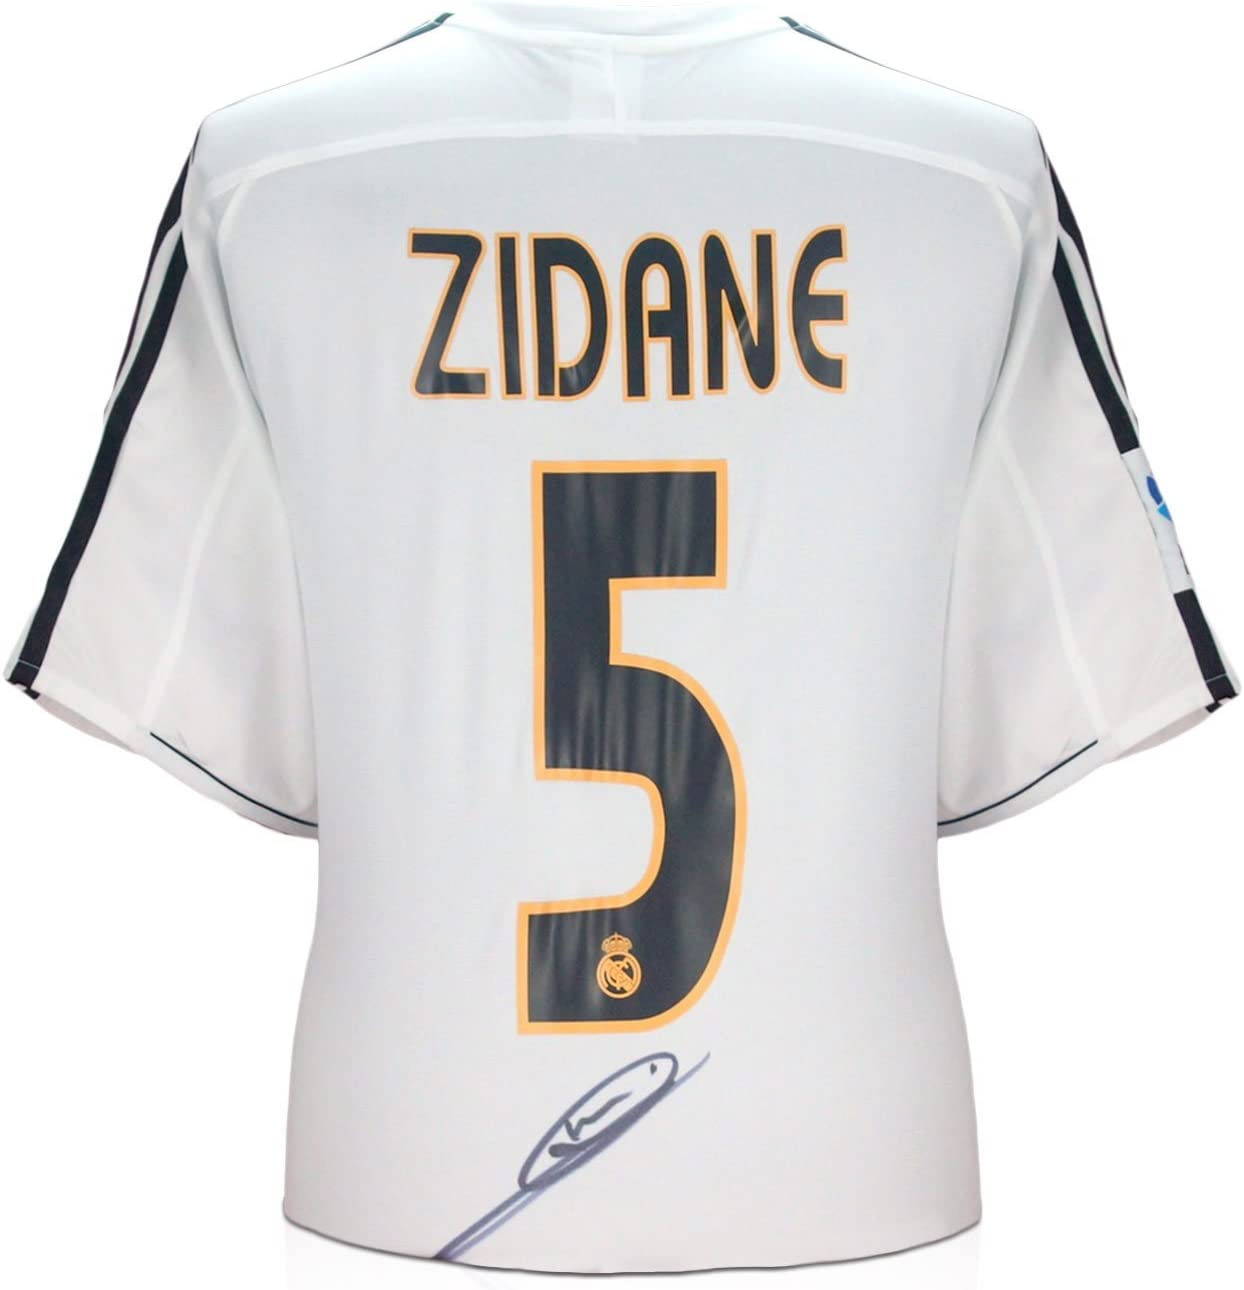 Zinedine Zidane Real Madrid 2003-04 camiseta de fútbol firmada ...